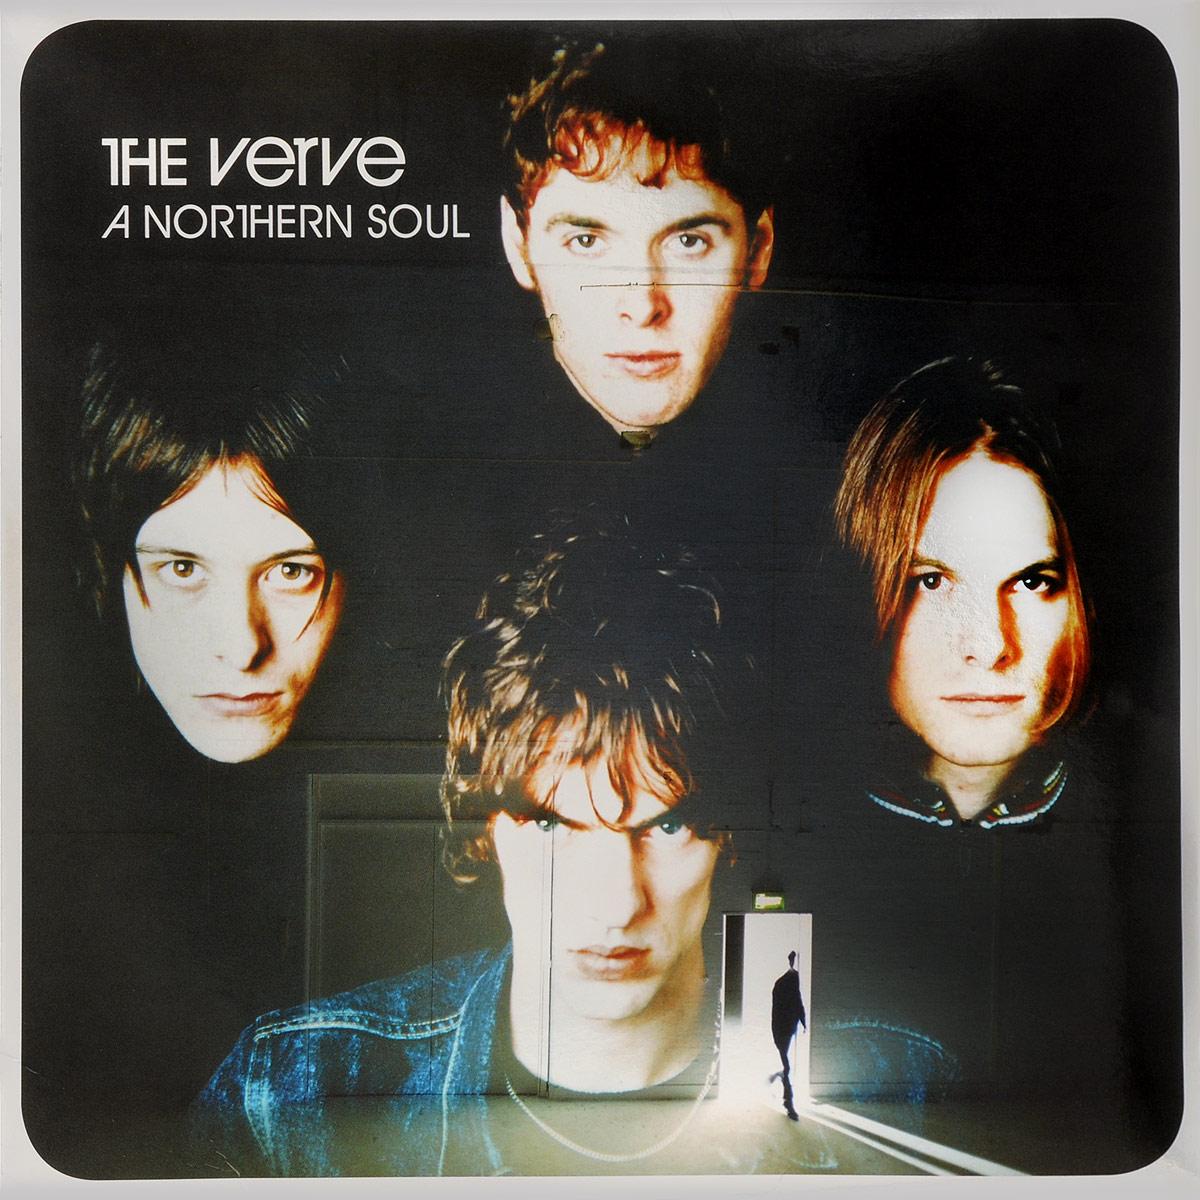 The Verve The Verve. A Northern Soul (2 LP) 4x3 5 aaaa 8 24 virgin hair